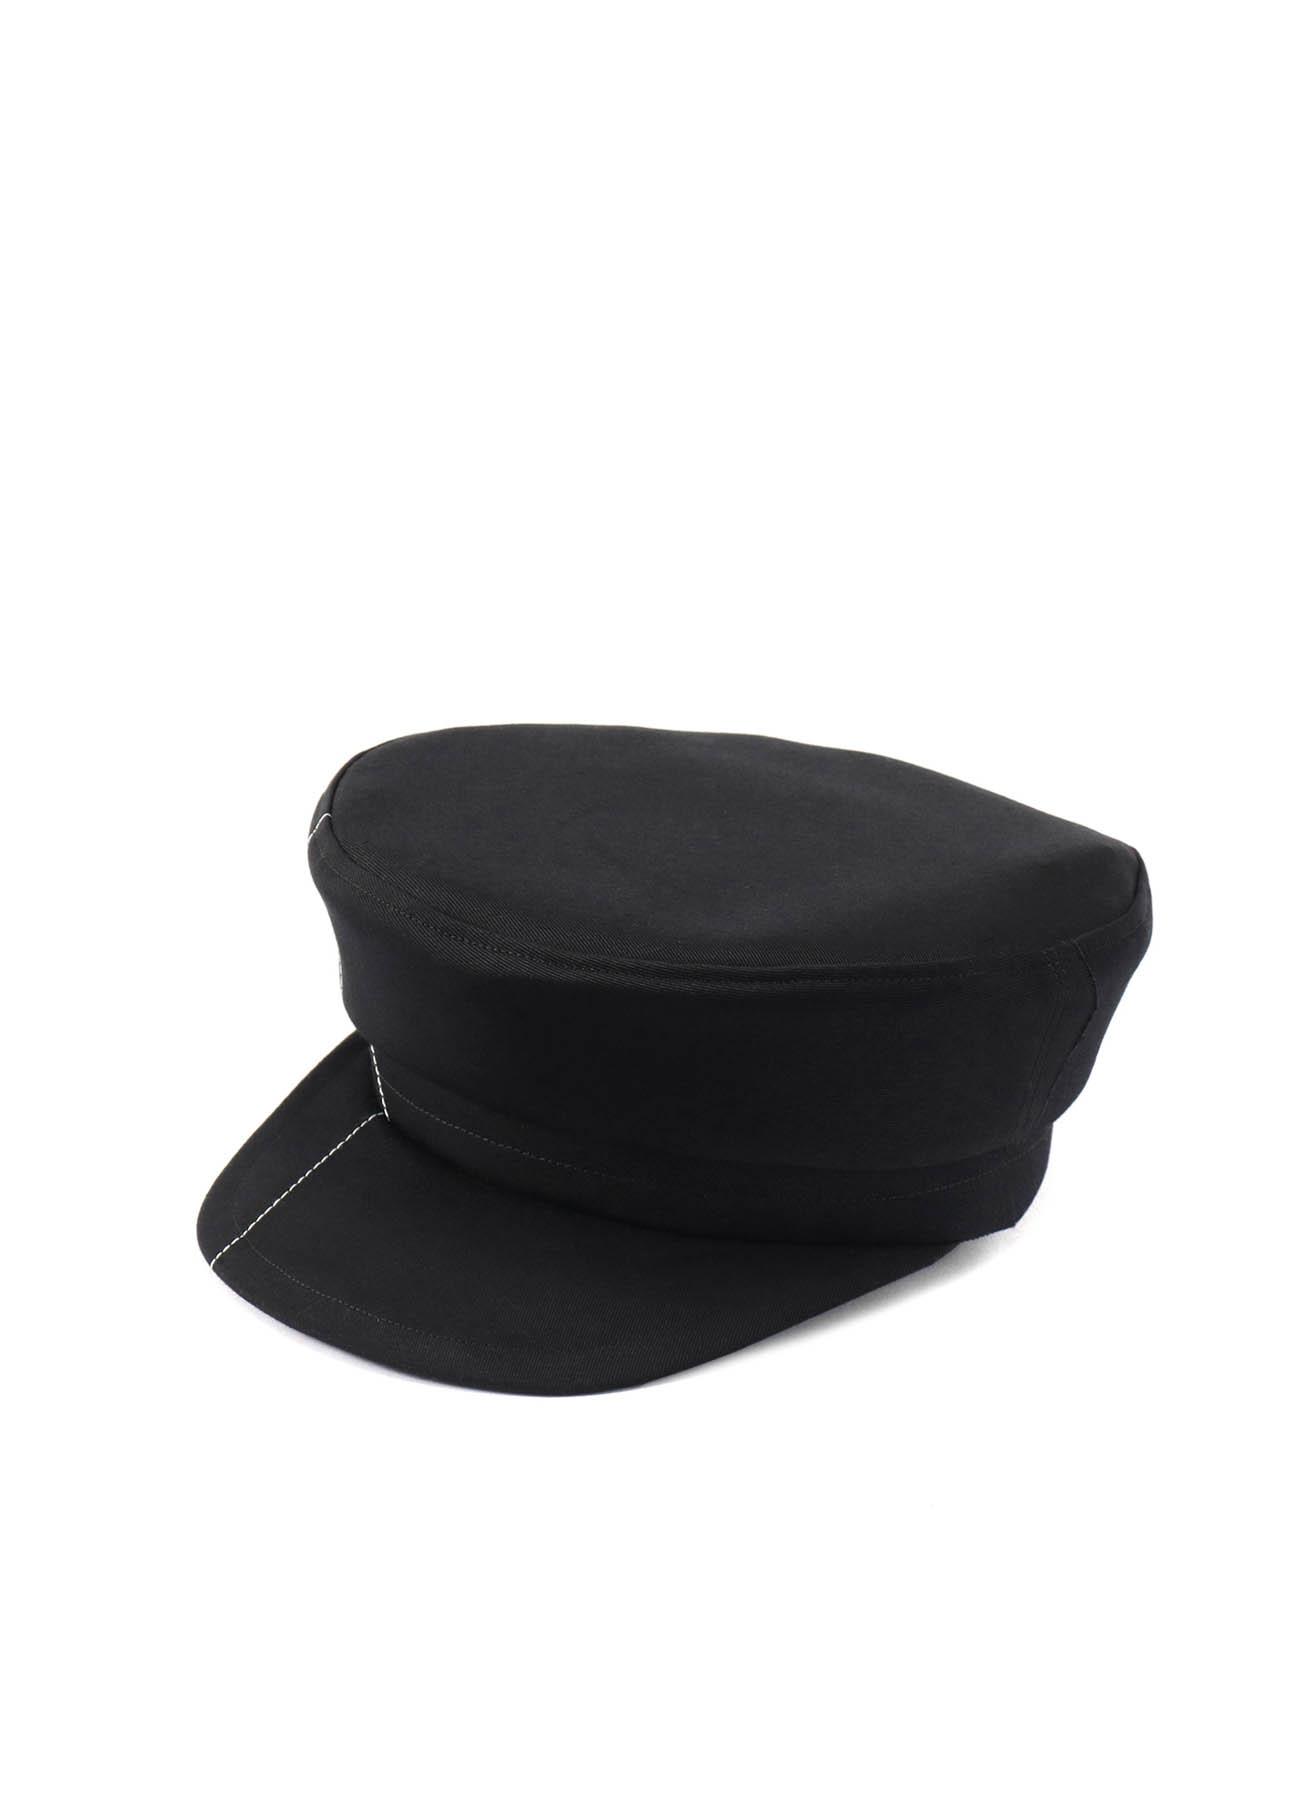 Ishica Cotton Gabardine Postman Cap